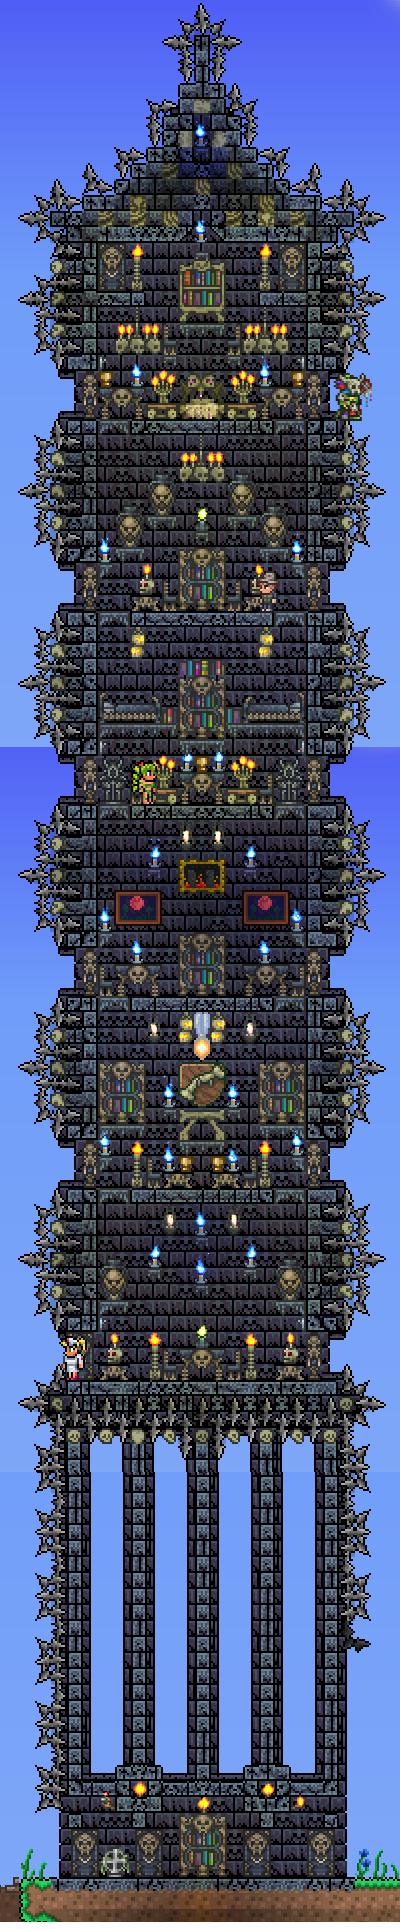 DungeonTower